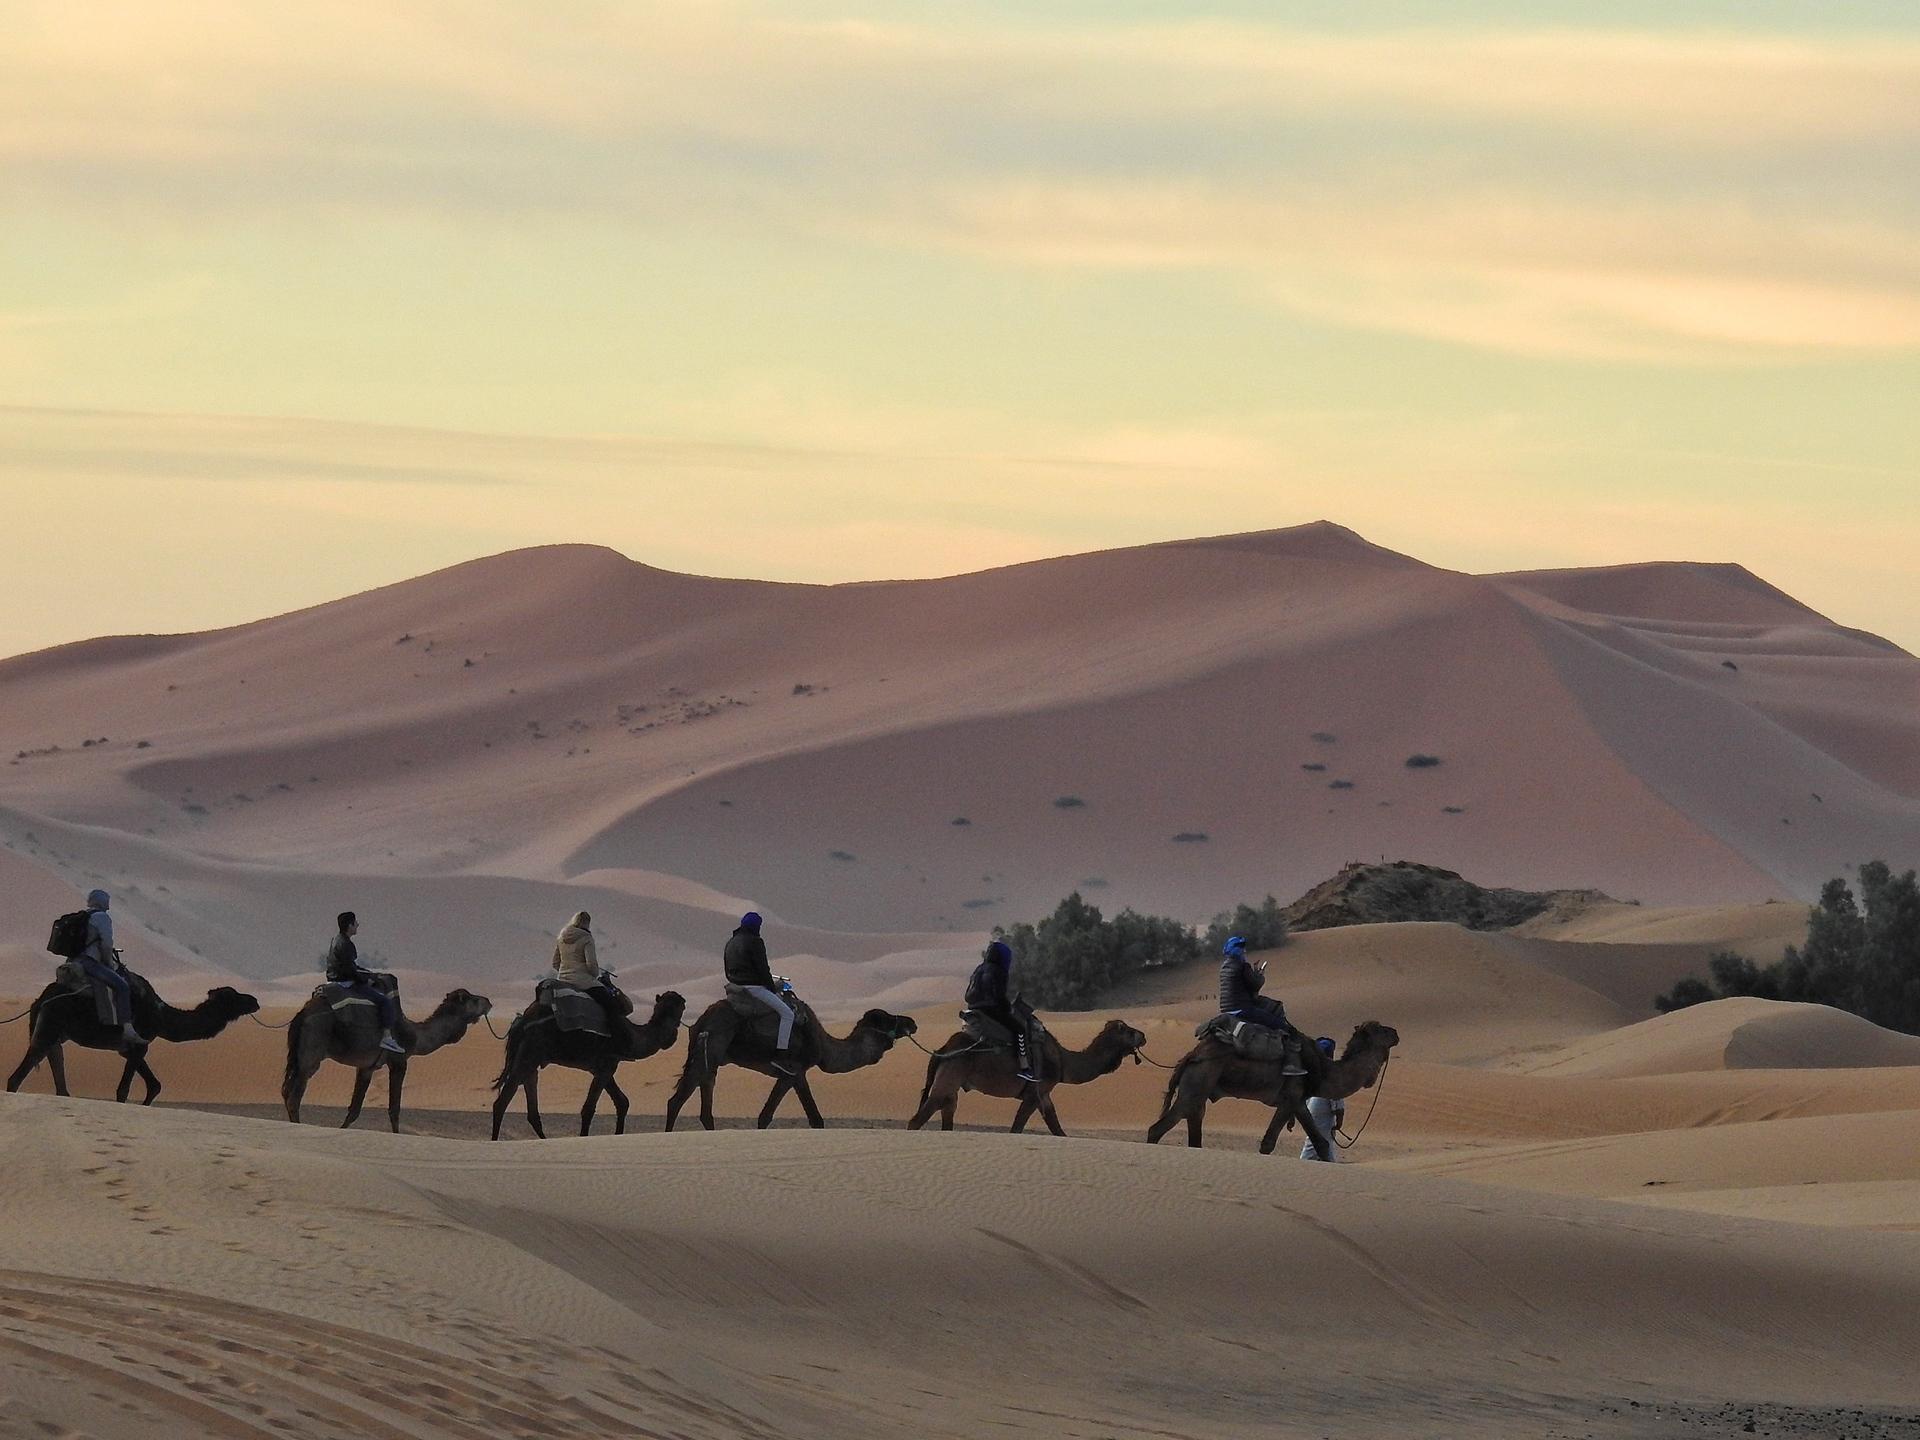 Hiking the desert | shec, adventure, camel, caravan